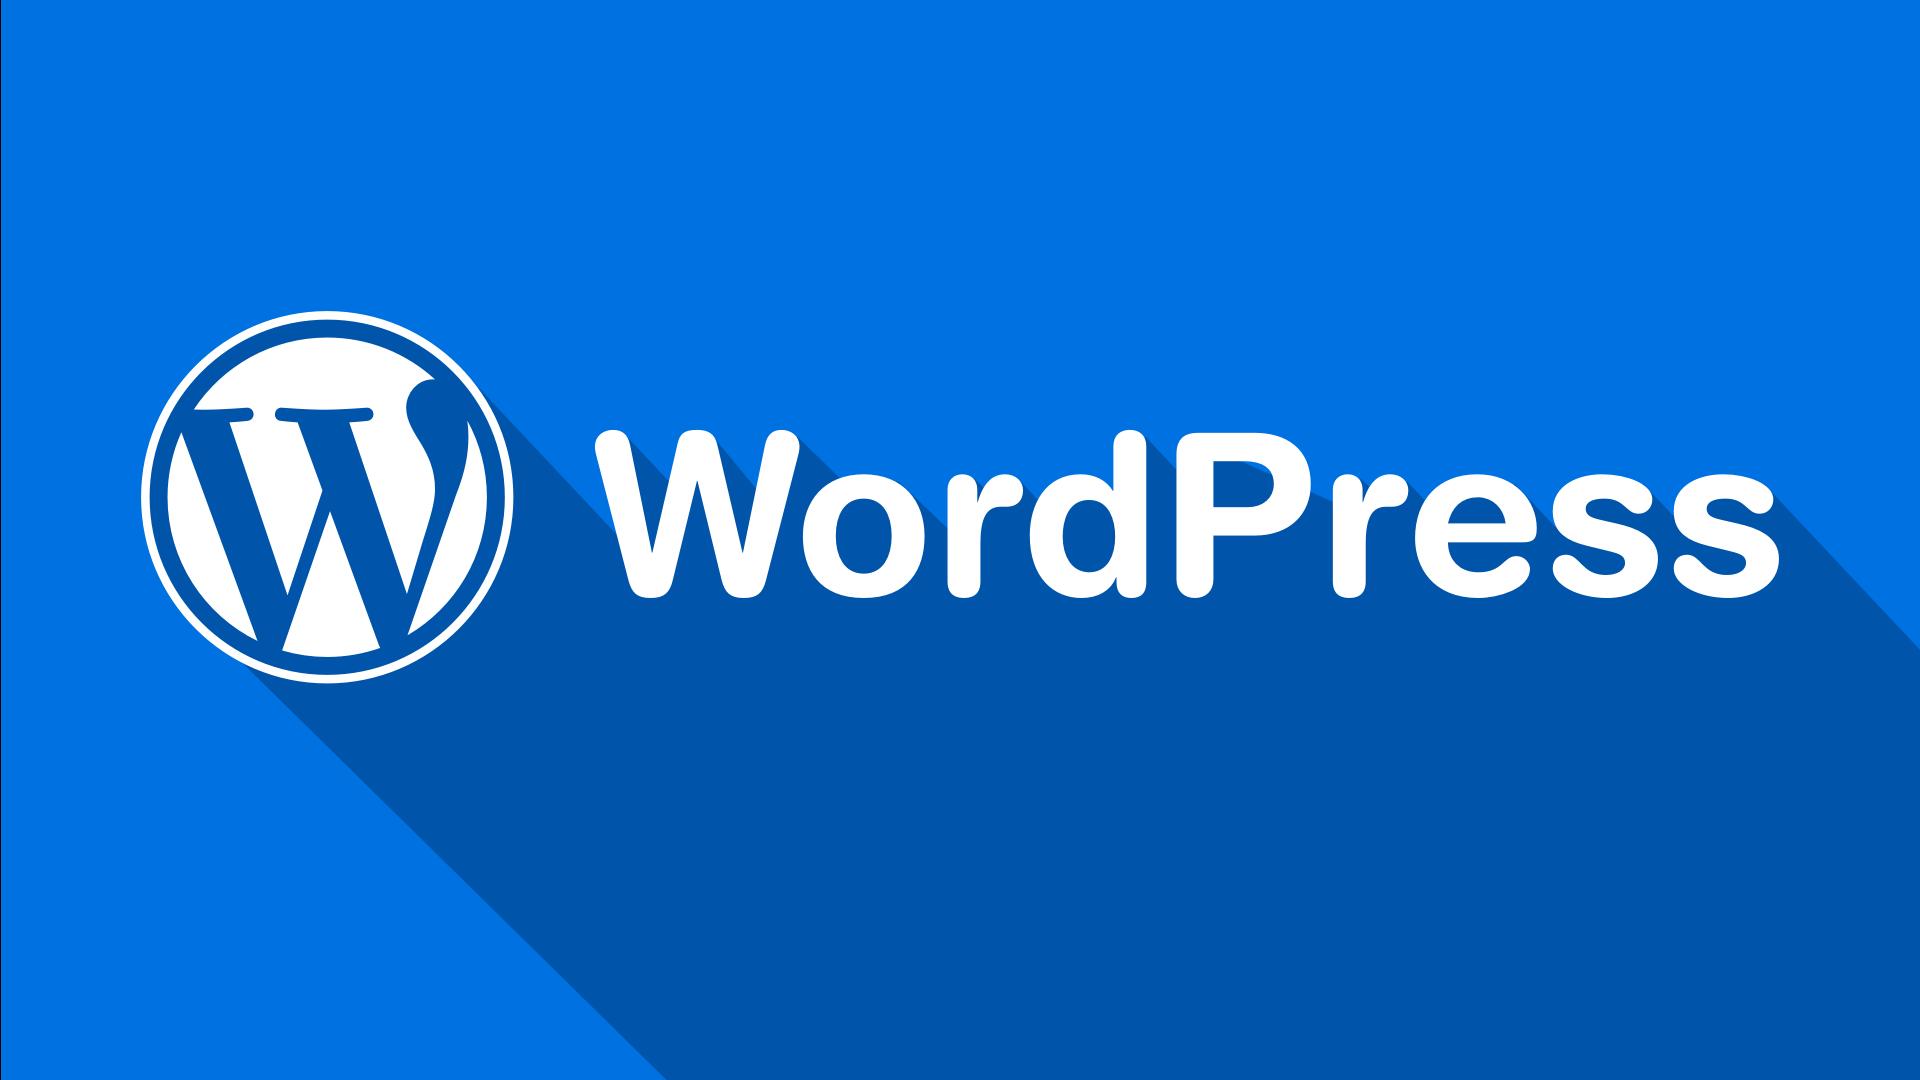 WordPress-Wallpaper-Professional